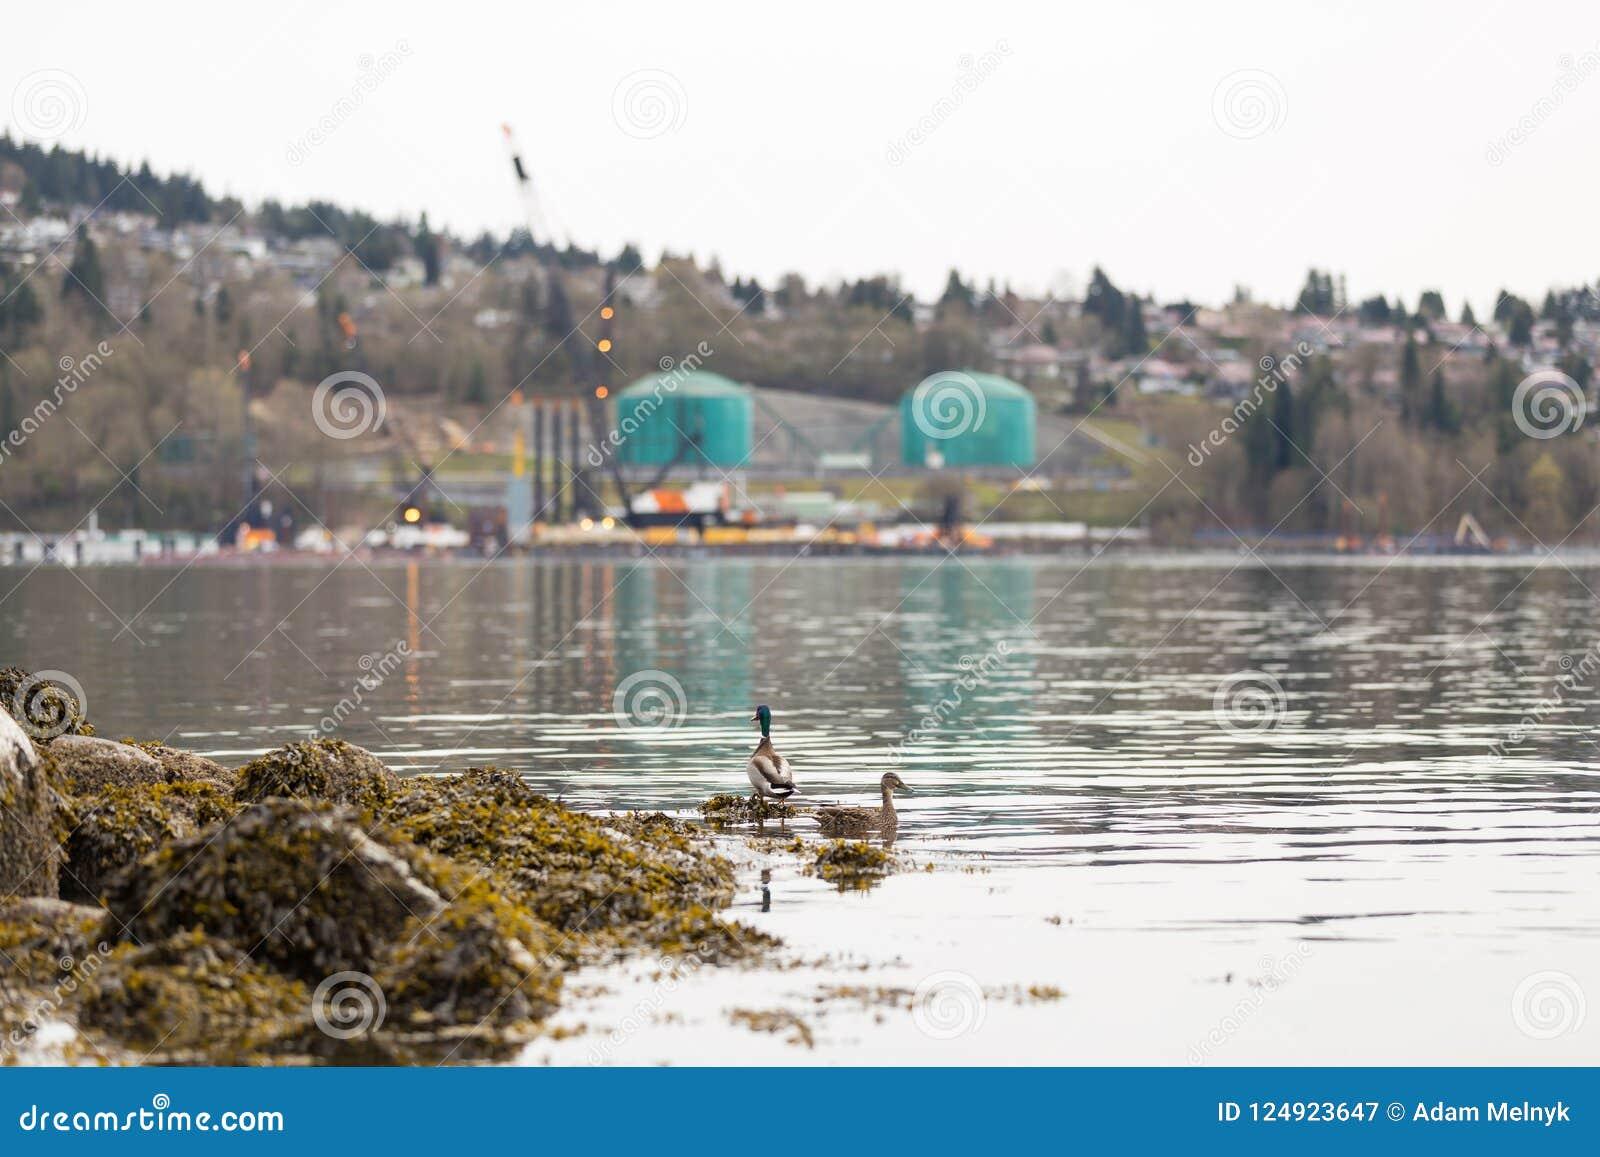 NORTH VANCOUVER, BC, CANADA - APR, 09, 2018: Oil tanker near the Parkland fuels refinery.